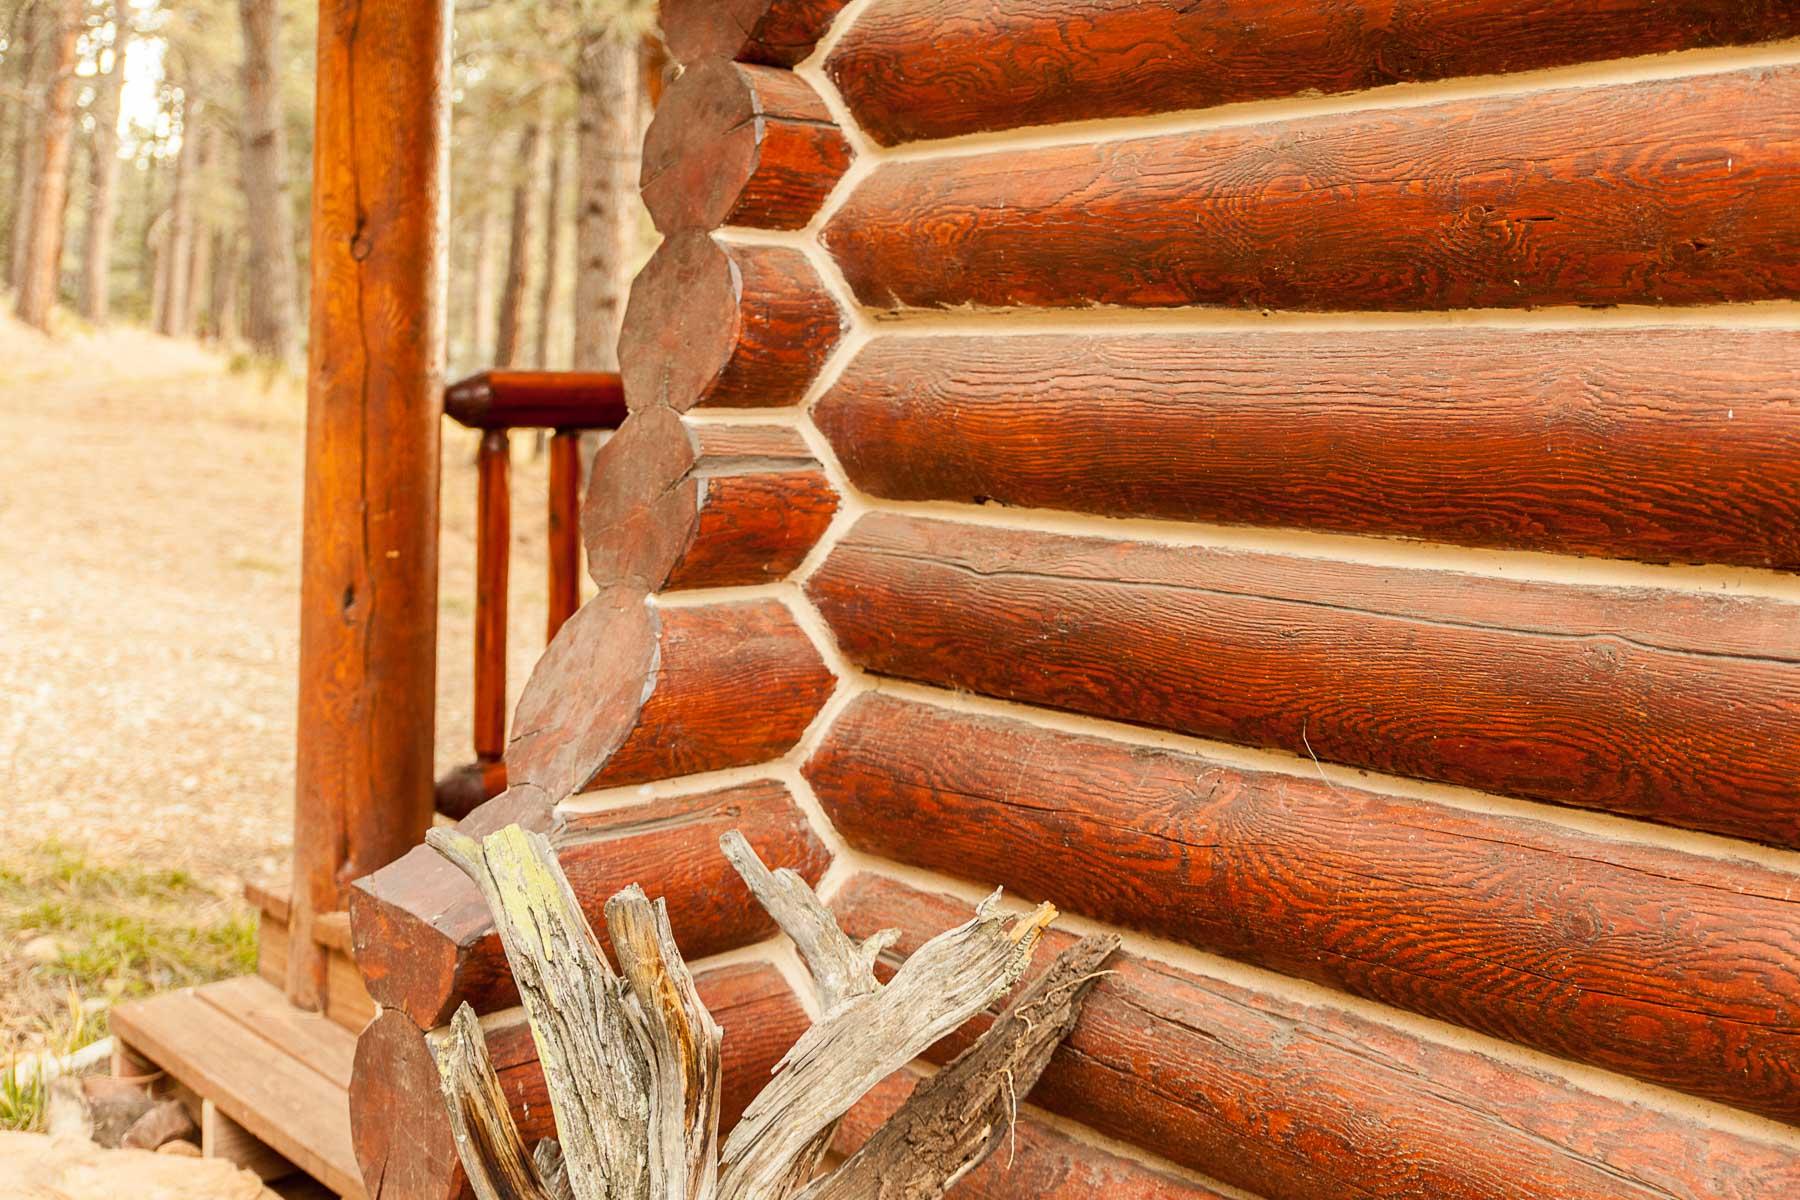 casita log home kit colorado new mexico-19.jpg